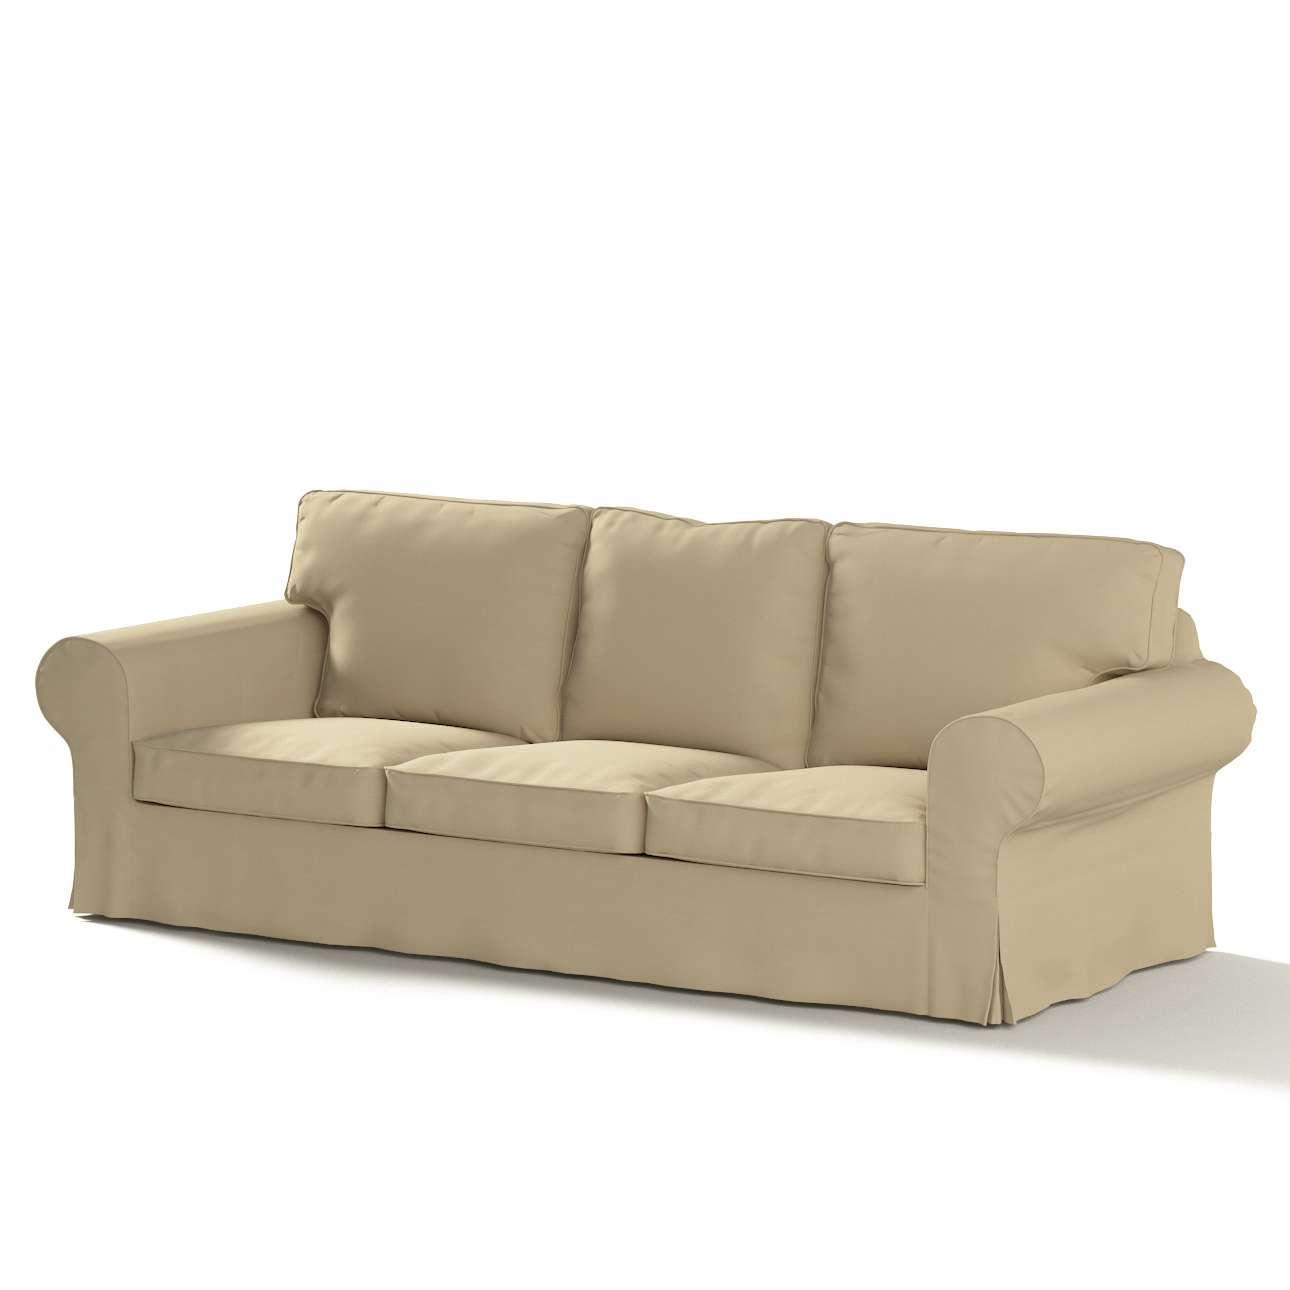 Ektorp 3-Sitzer Schlafsofabezug, ALTES Modell Sofahusse Ektorp 3-Sitzer Schlafsofa von der Kollektion Cotton Panama, Stoff: 702-01